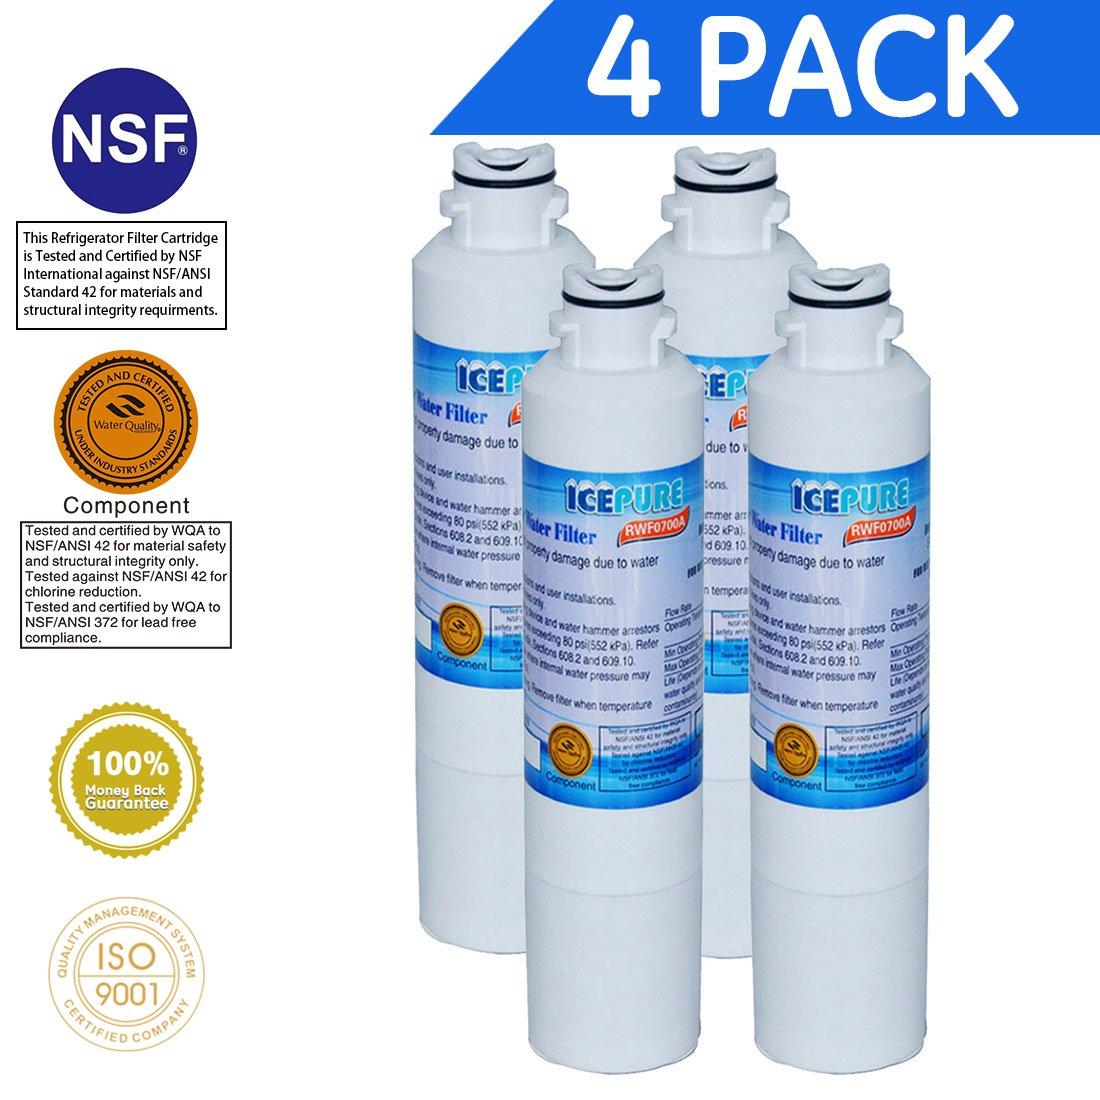 Icepure DA2900020B replacement refrigerator water filter For Samsung DA2900020B,DA2900020A,HAF-CIN(4-Pack)